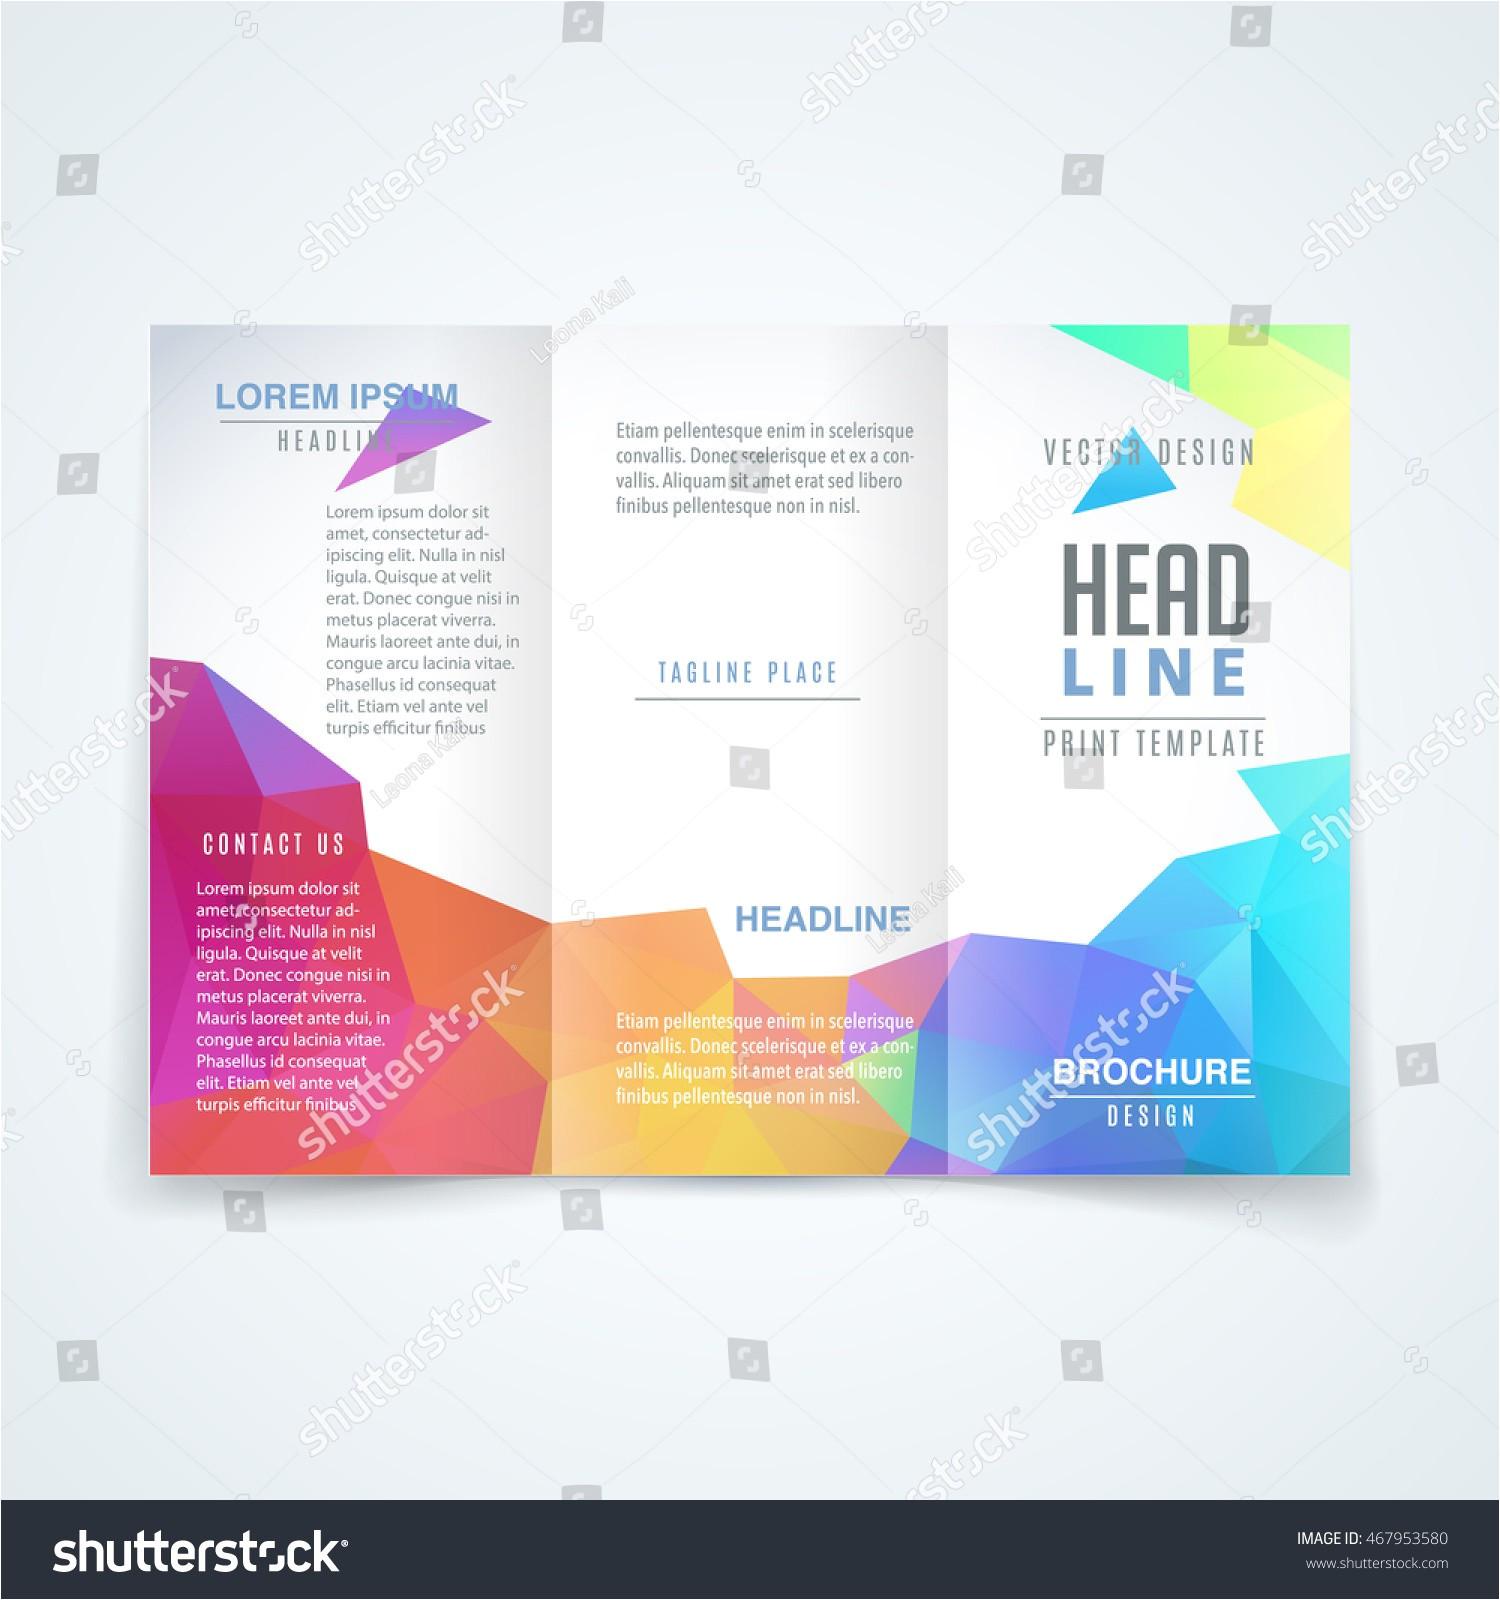 brochure design templates cdr format free download